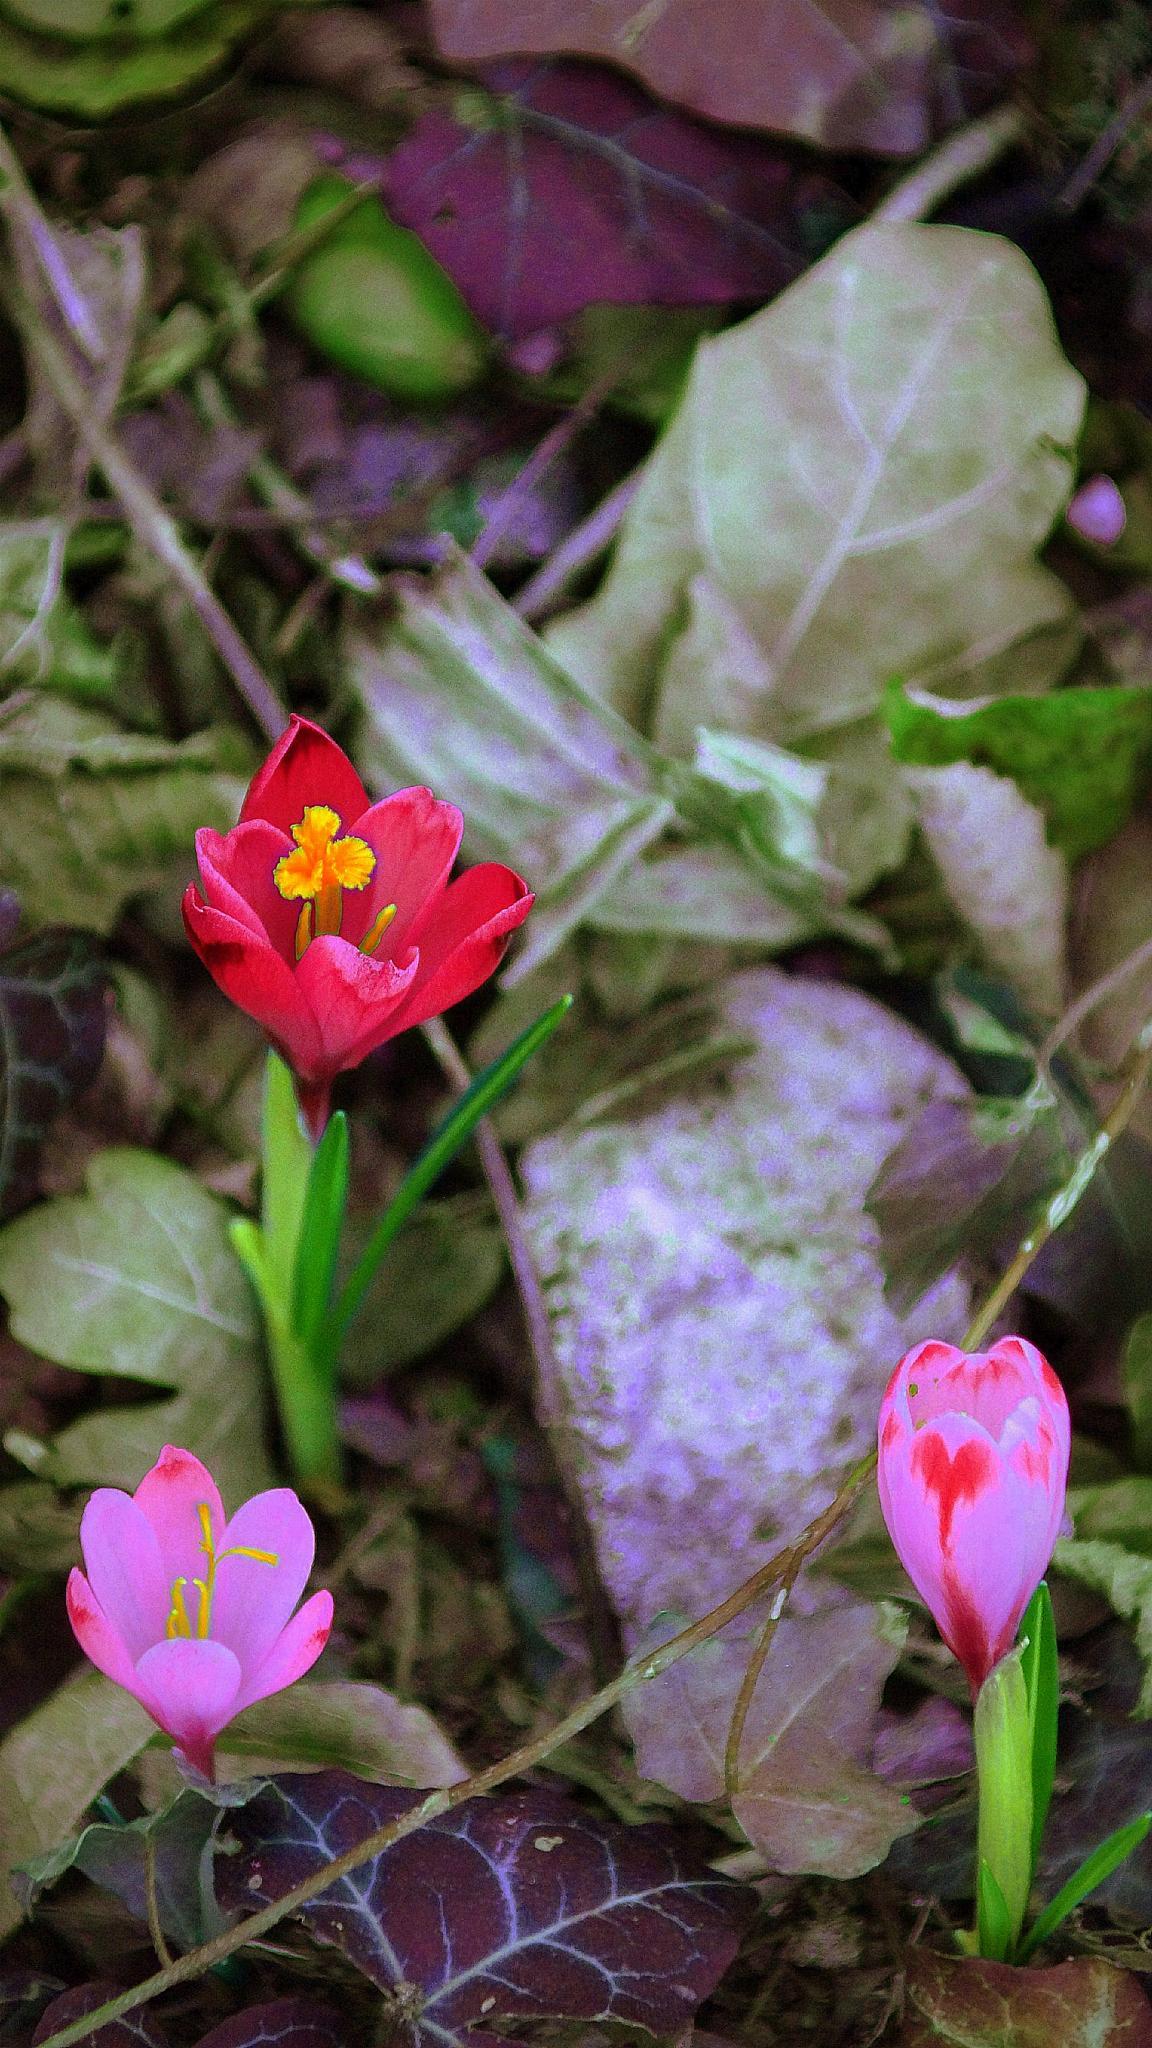 Some of colorful forest flowers by sreten nakićenović